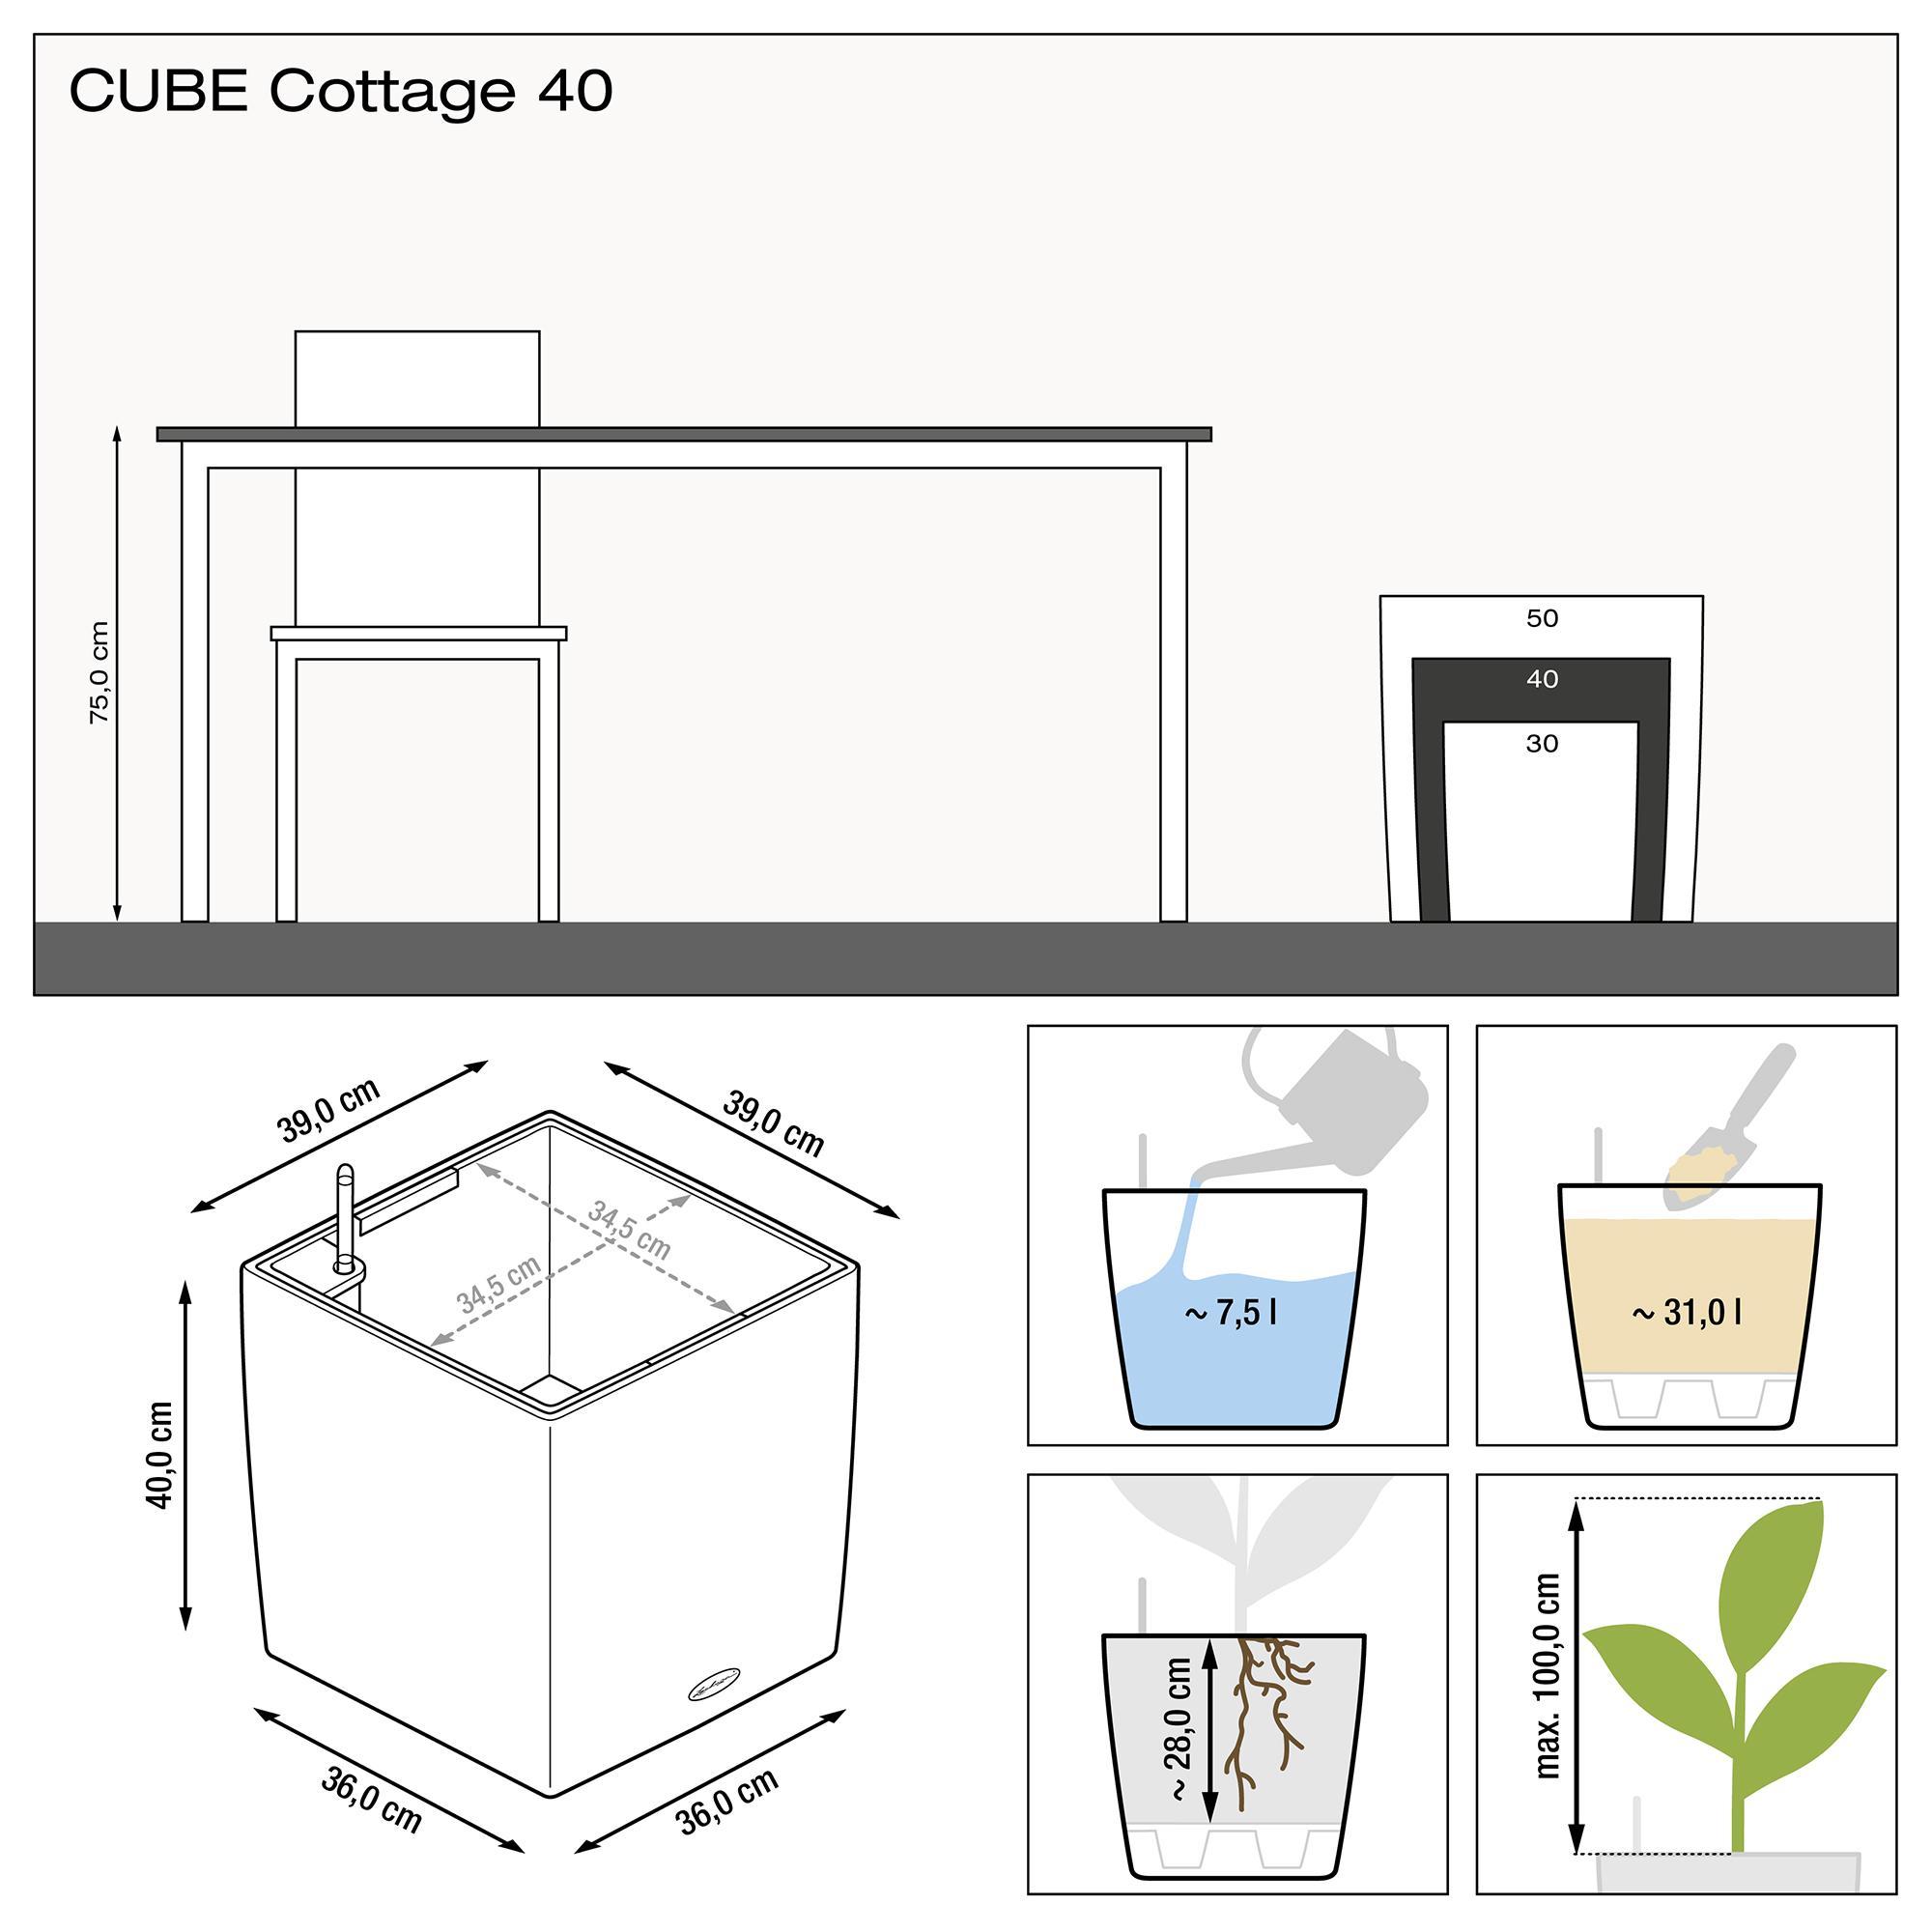 CUBE Cottage 40 granite - Image 3